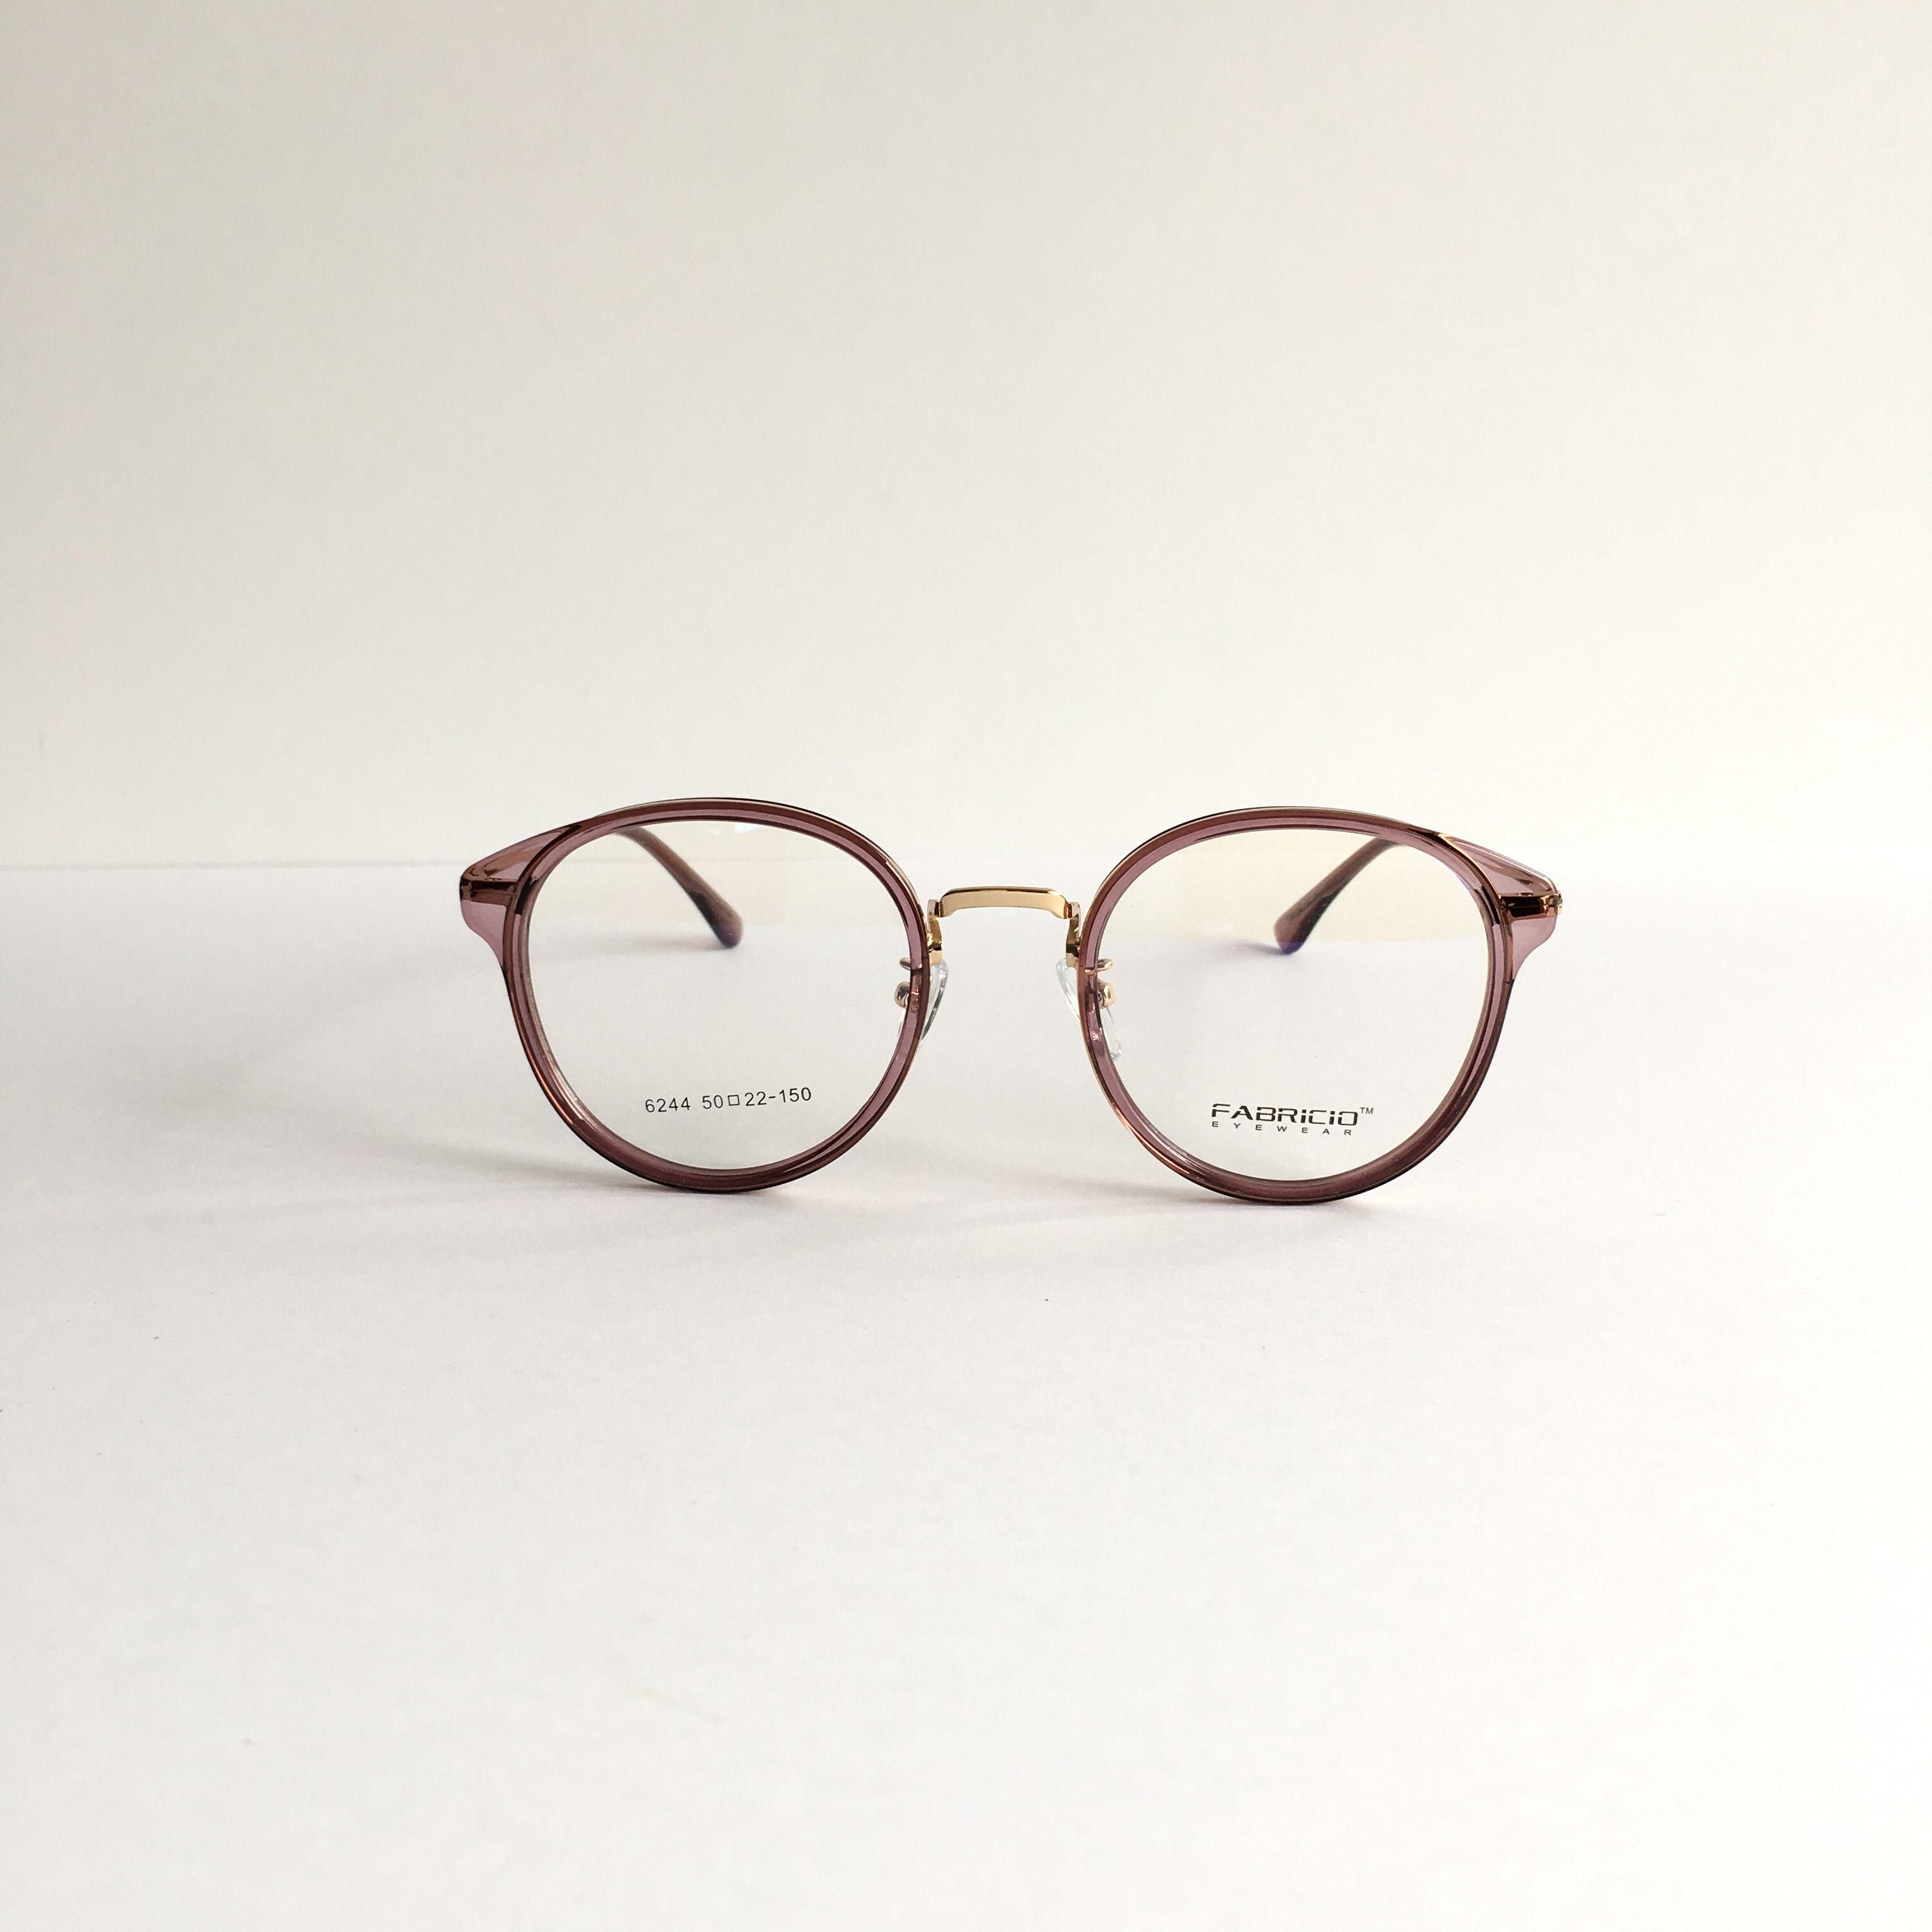 pr brands all barnard levit eyewear jaguar cartier glasses